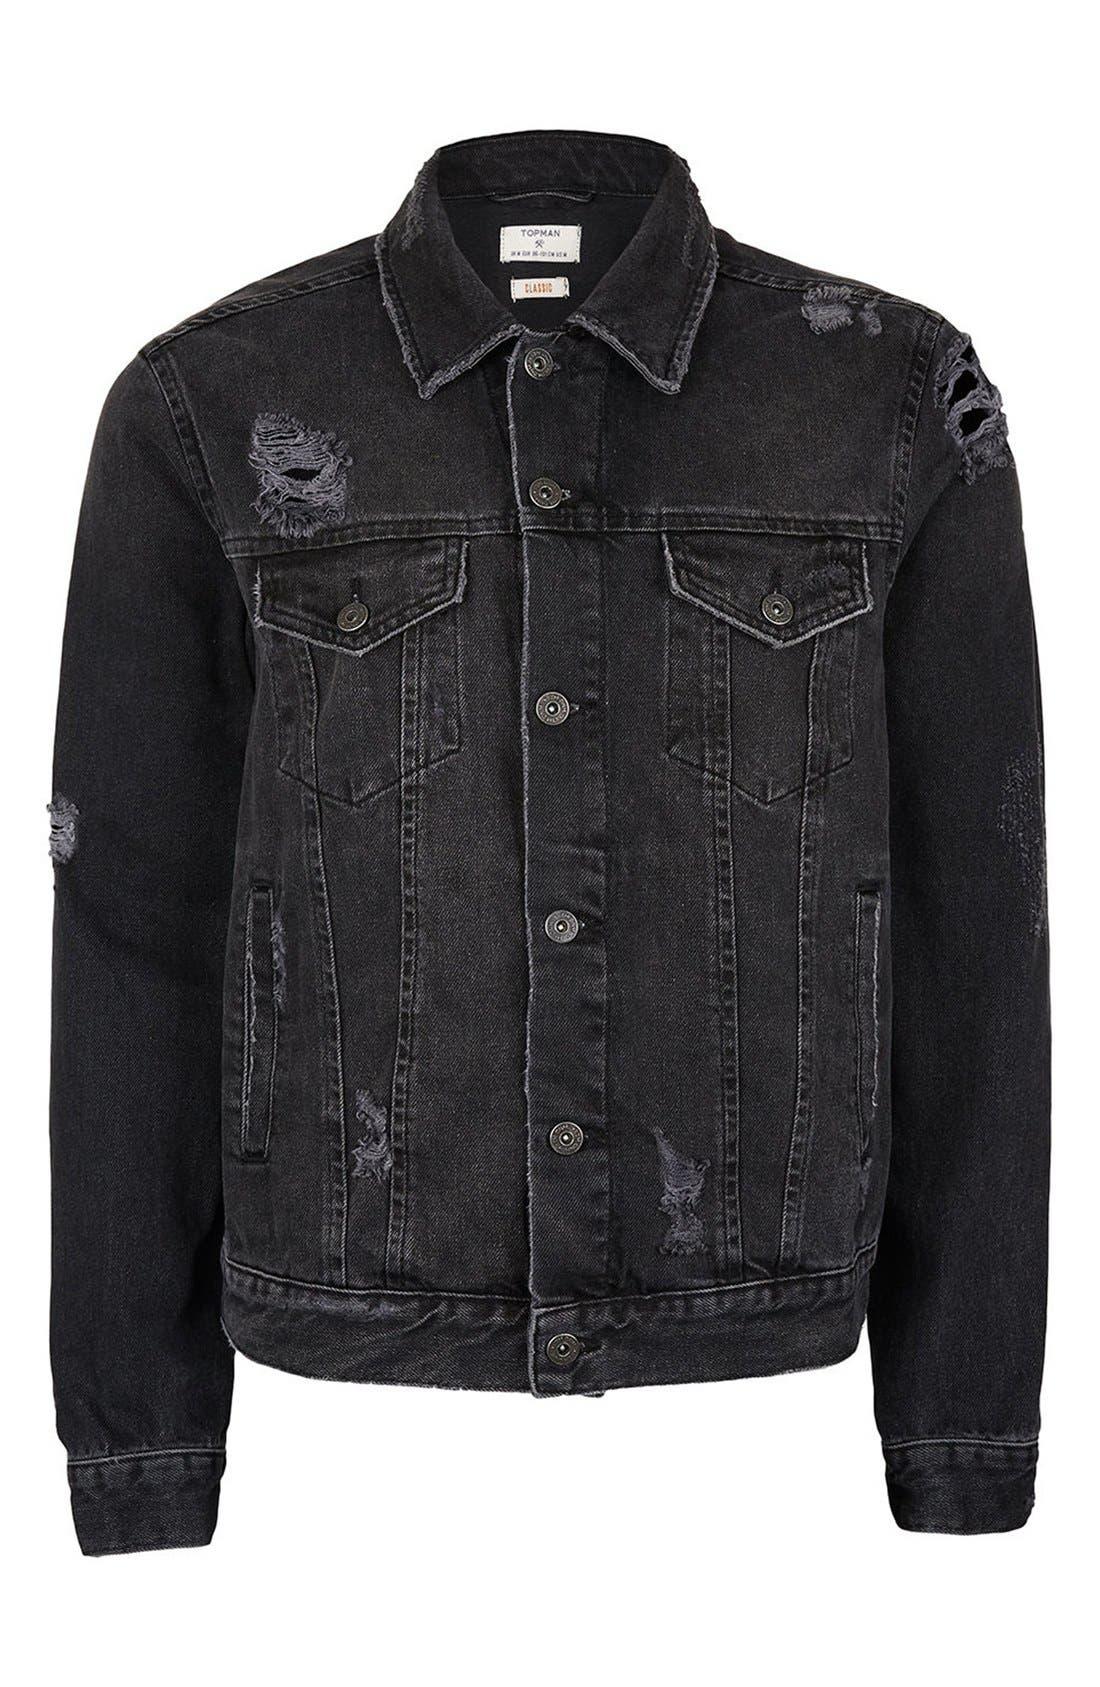 Distressed Denim Jacket,                             Alternate thumbnail 10, color,                             001